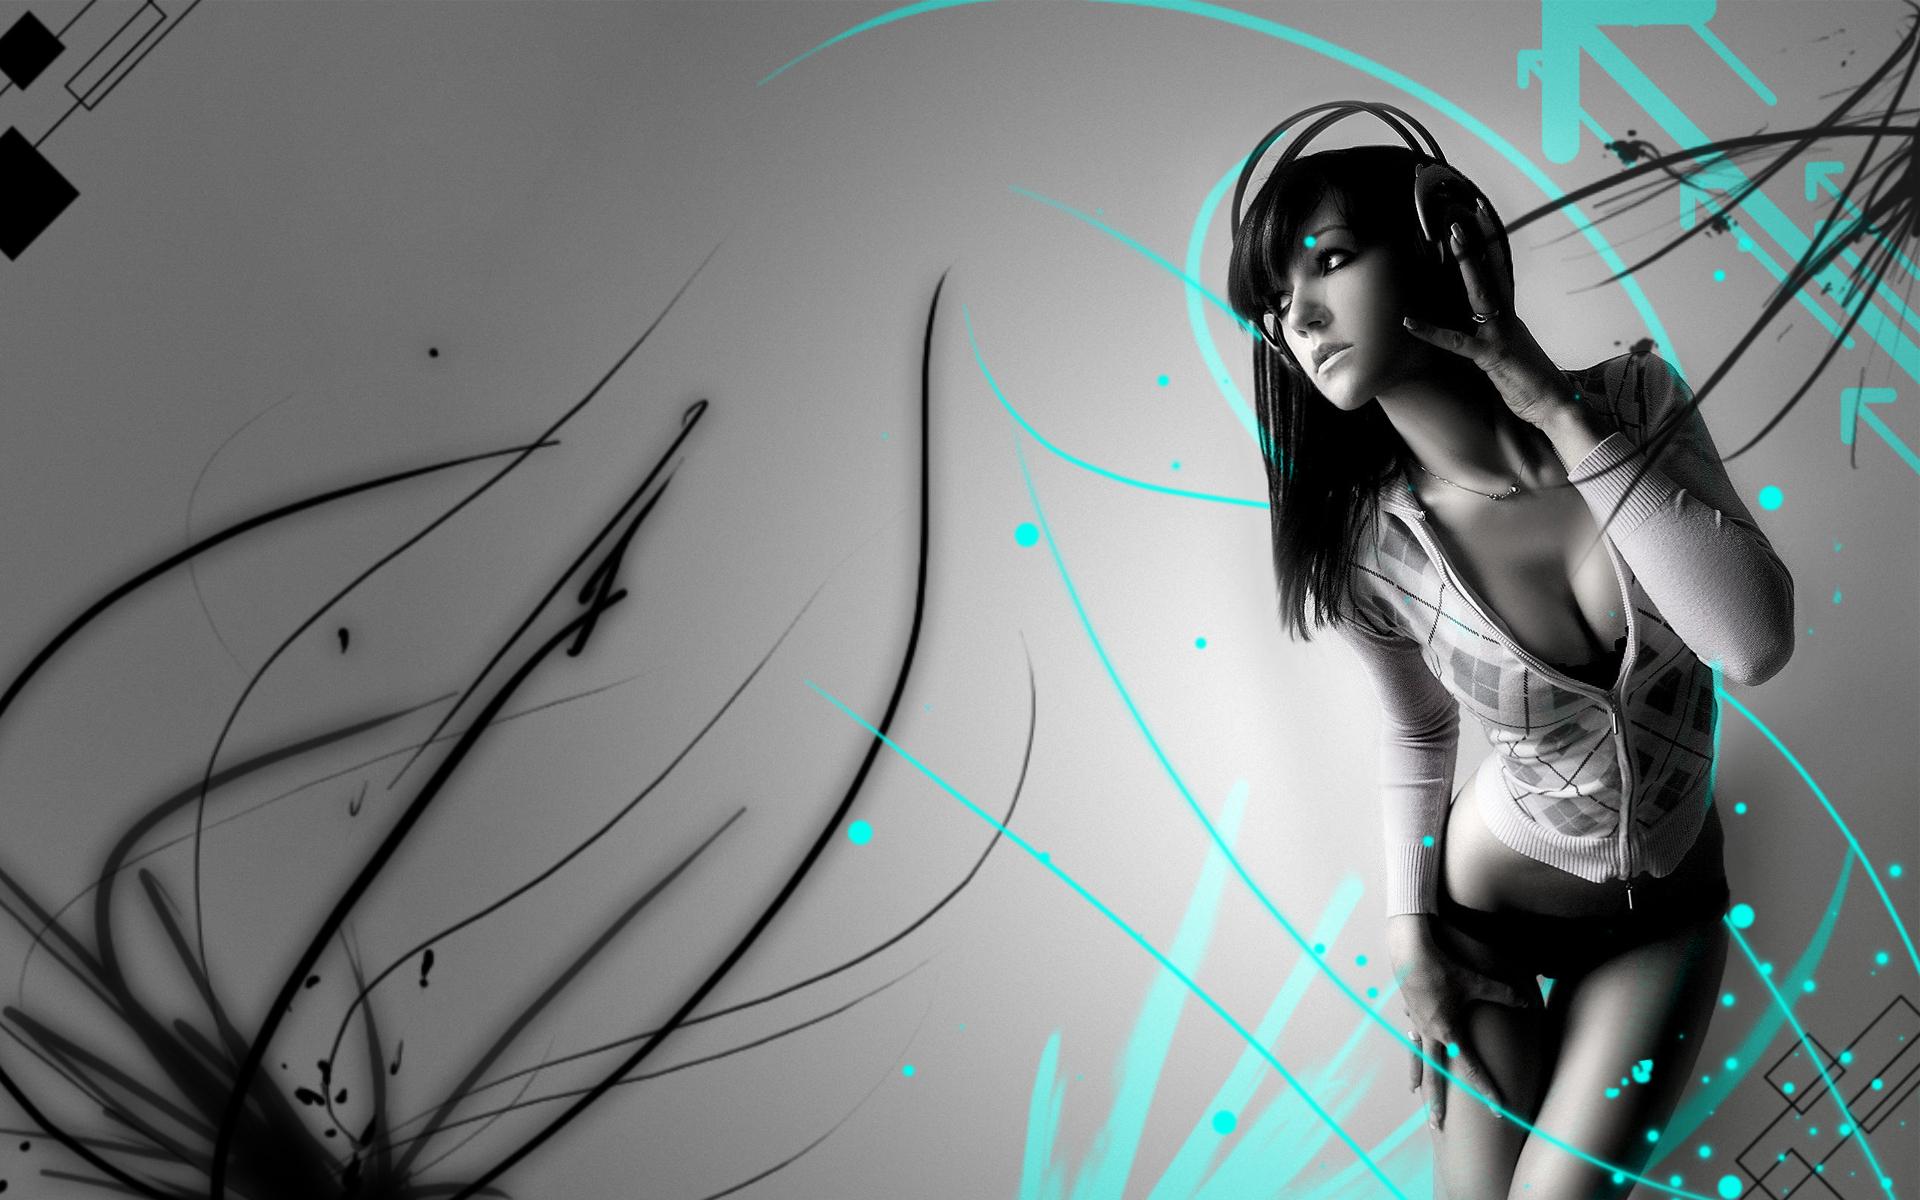 Iphone Wallpaper Music Lovely Hd Music Wallpapers Wallpaper